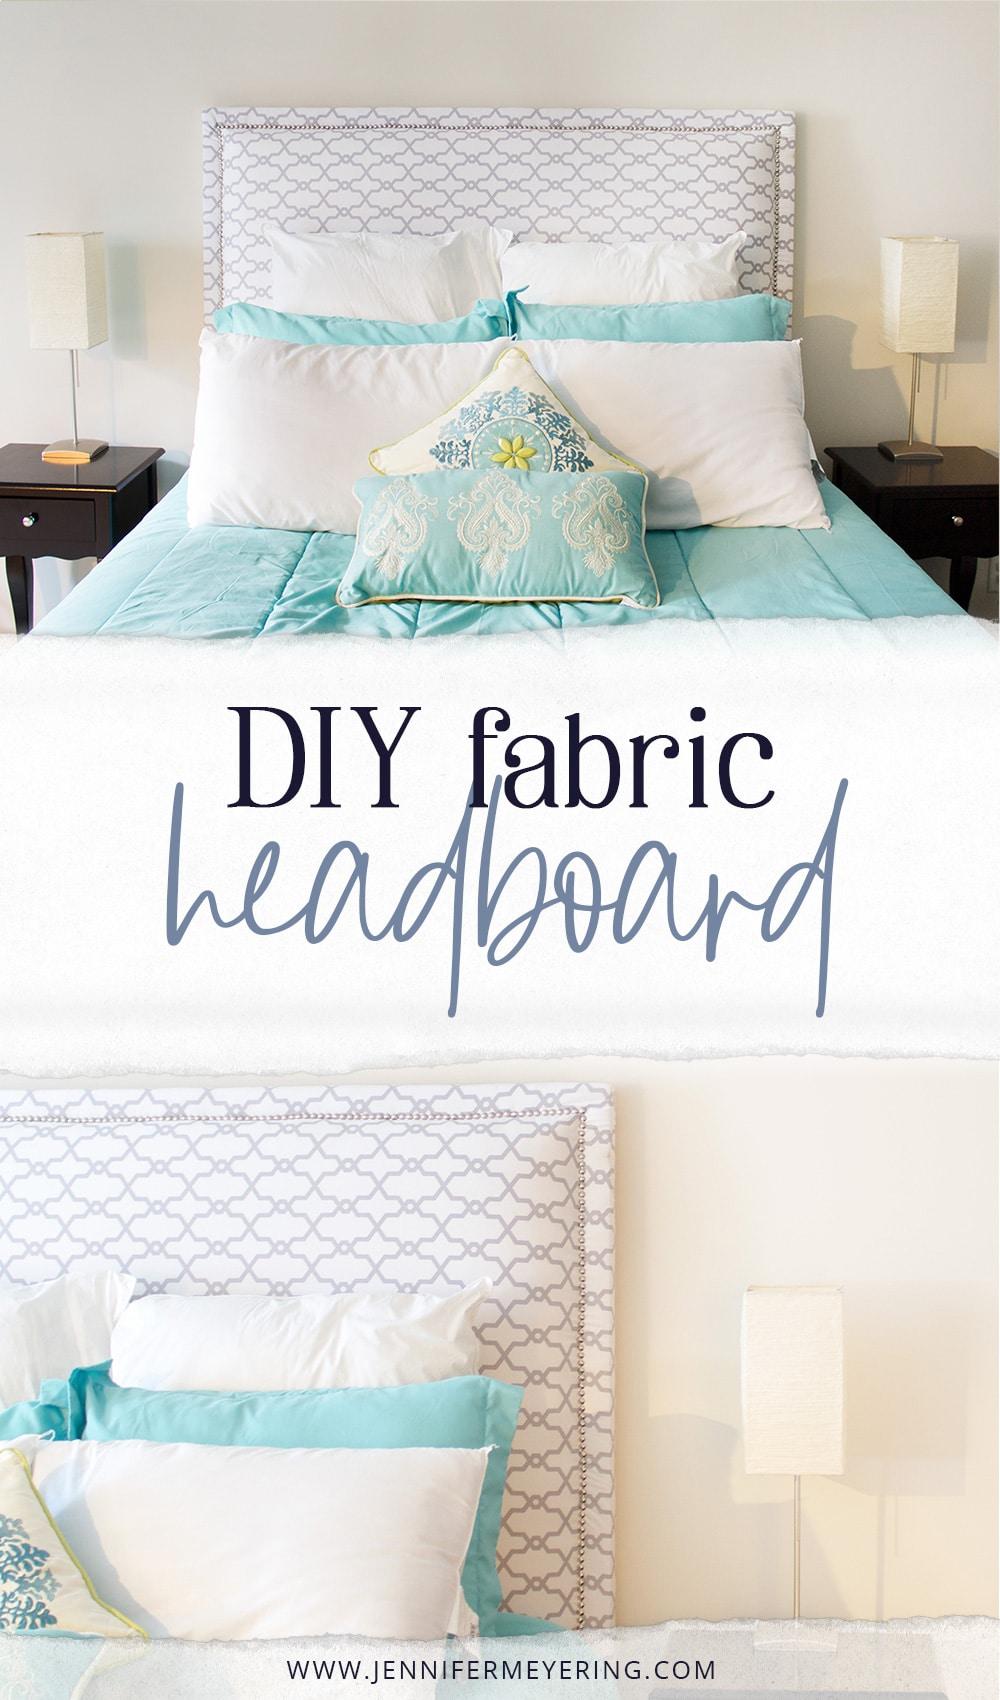 DIY Fabric Headboard -- JenniferMeyering.com